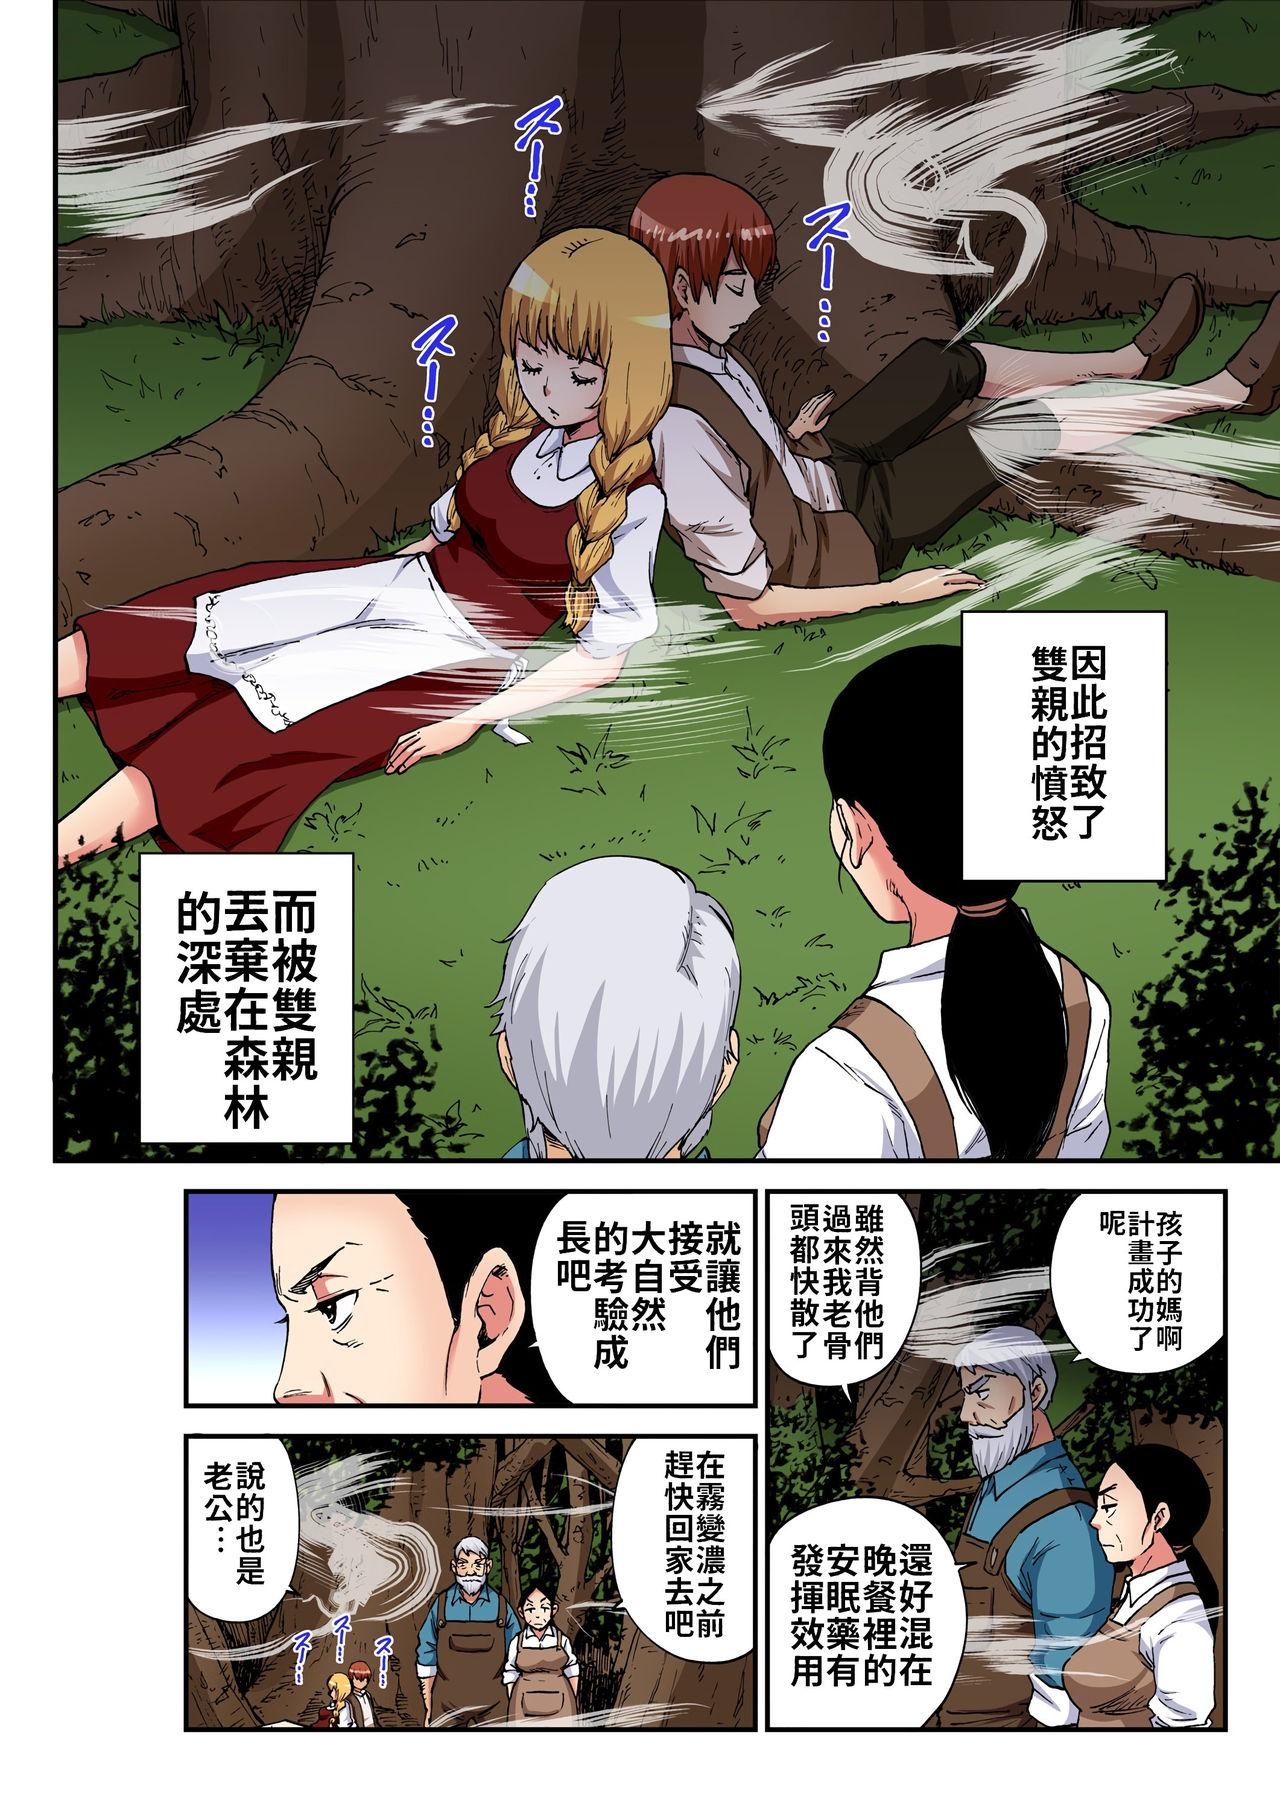 Otona no Douwa ~Henzeru to Gure-teru   大人的童話~糖果屋 2